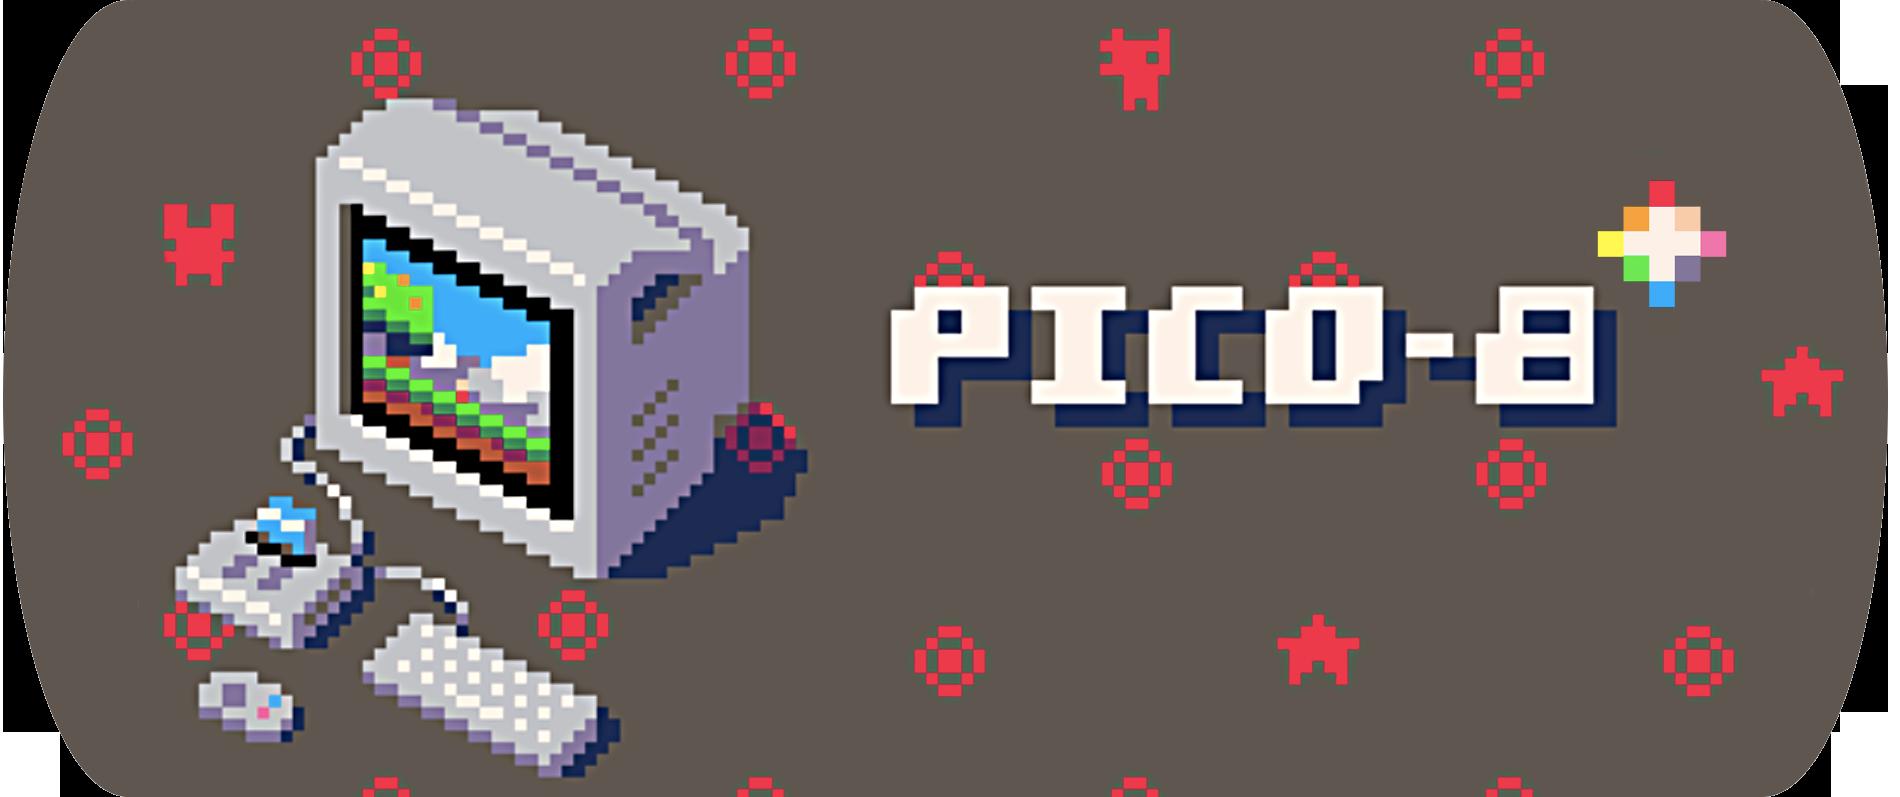 A__Pico-8 C.png